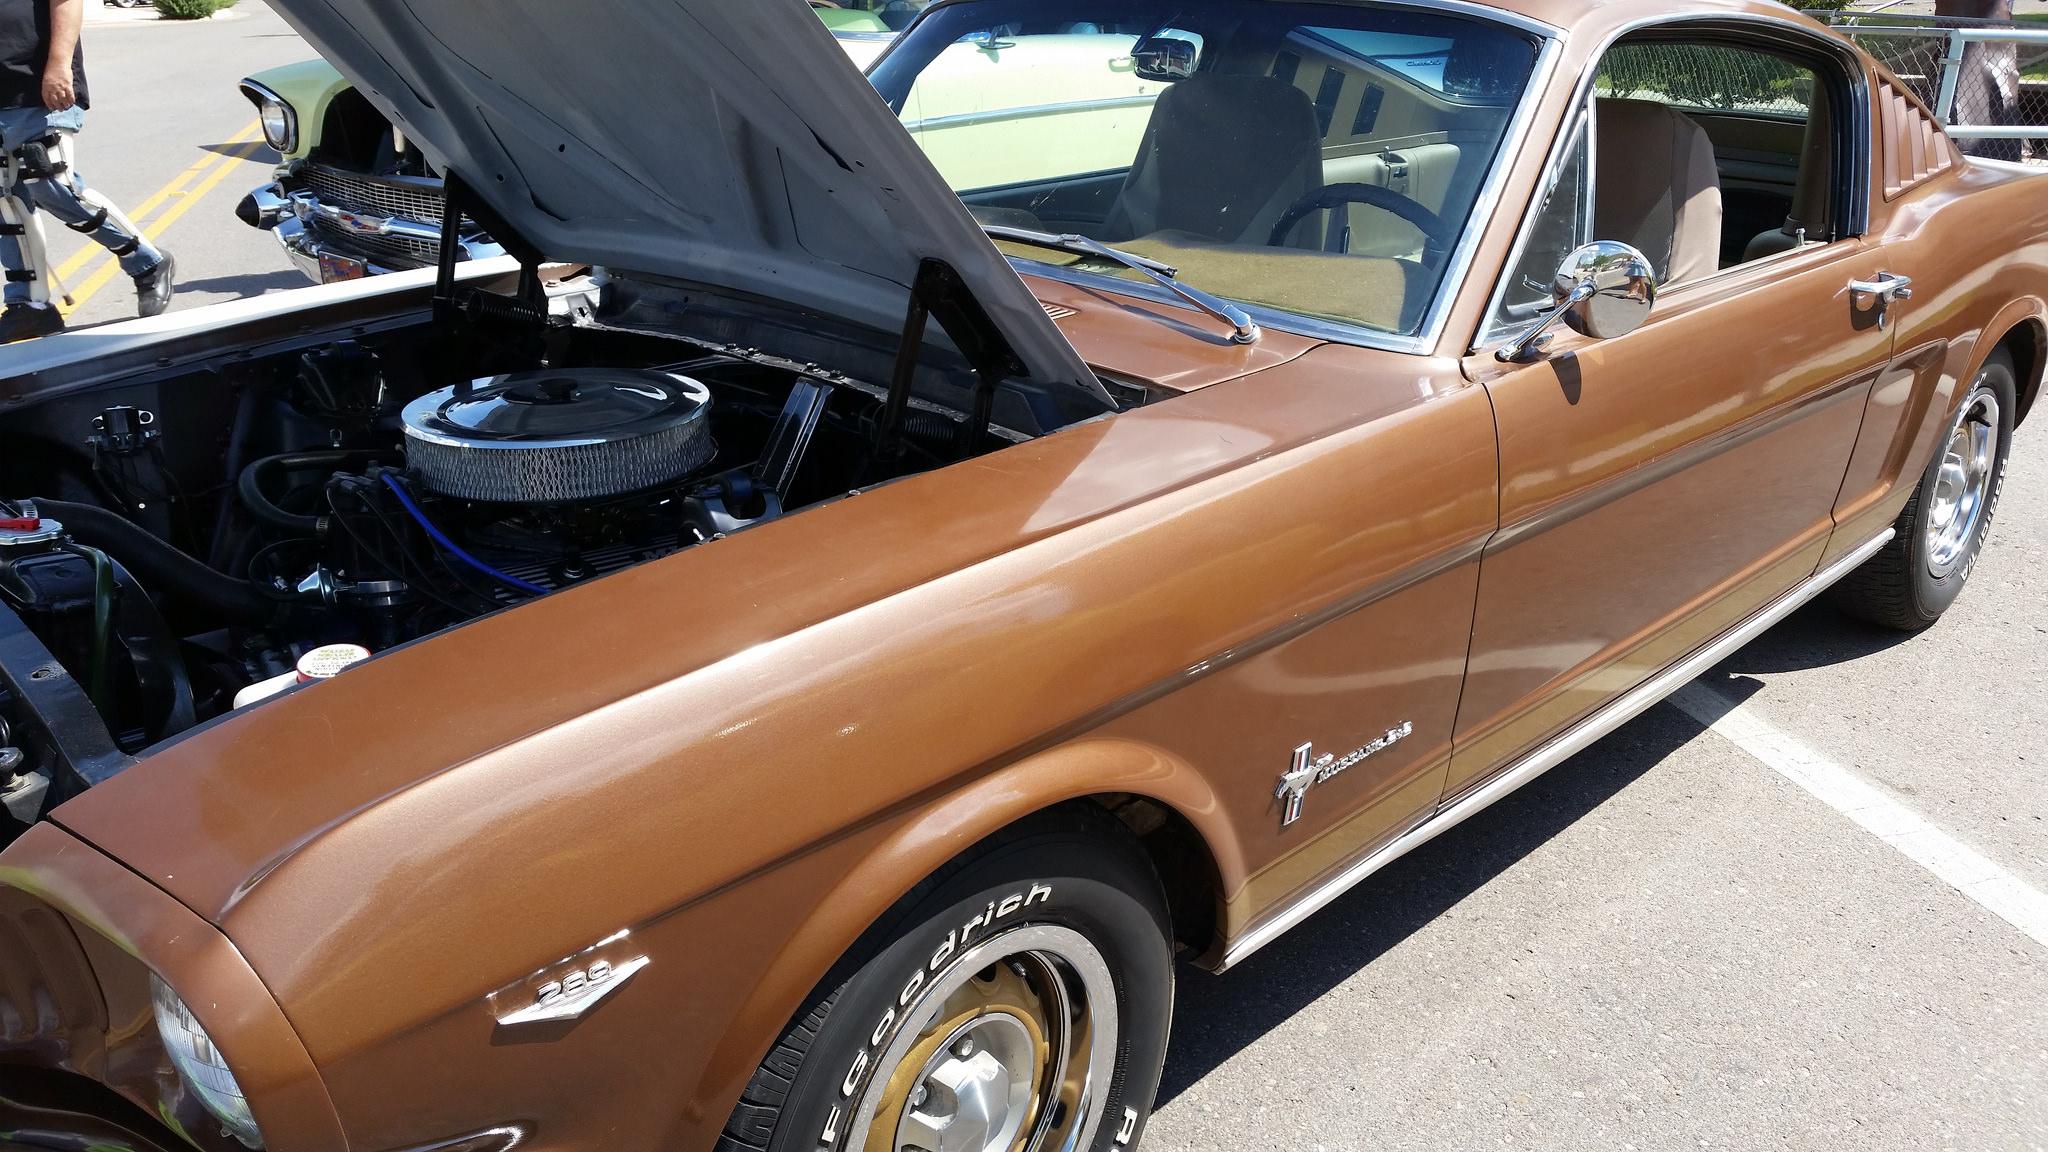 Bisbee Car Show Coming Up Arizona News - Bisbee car show